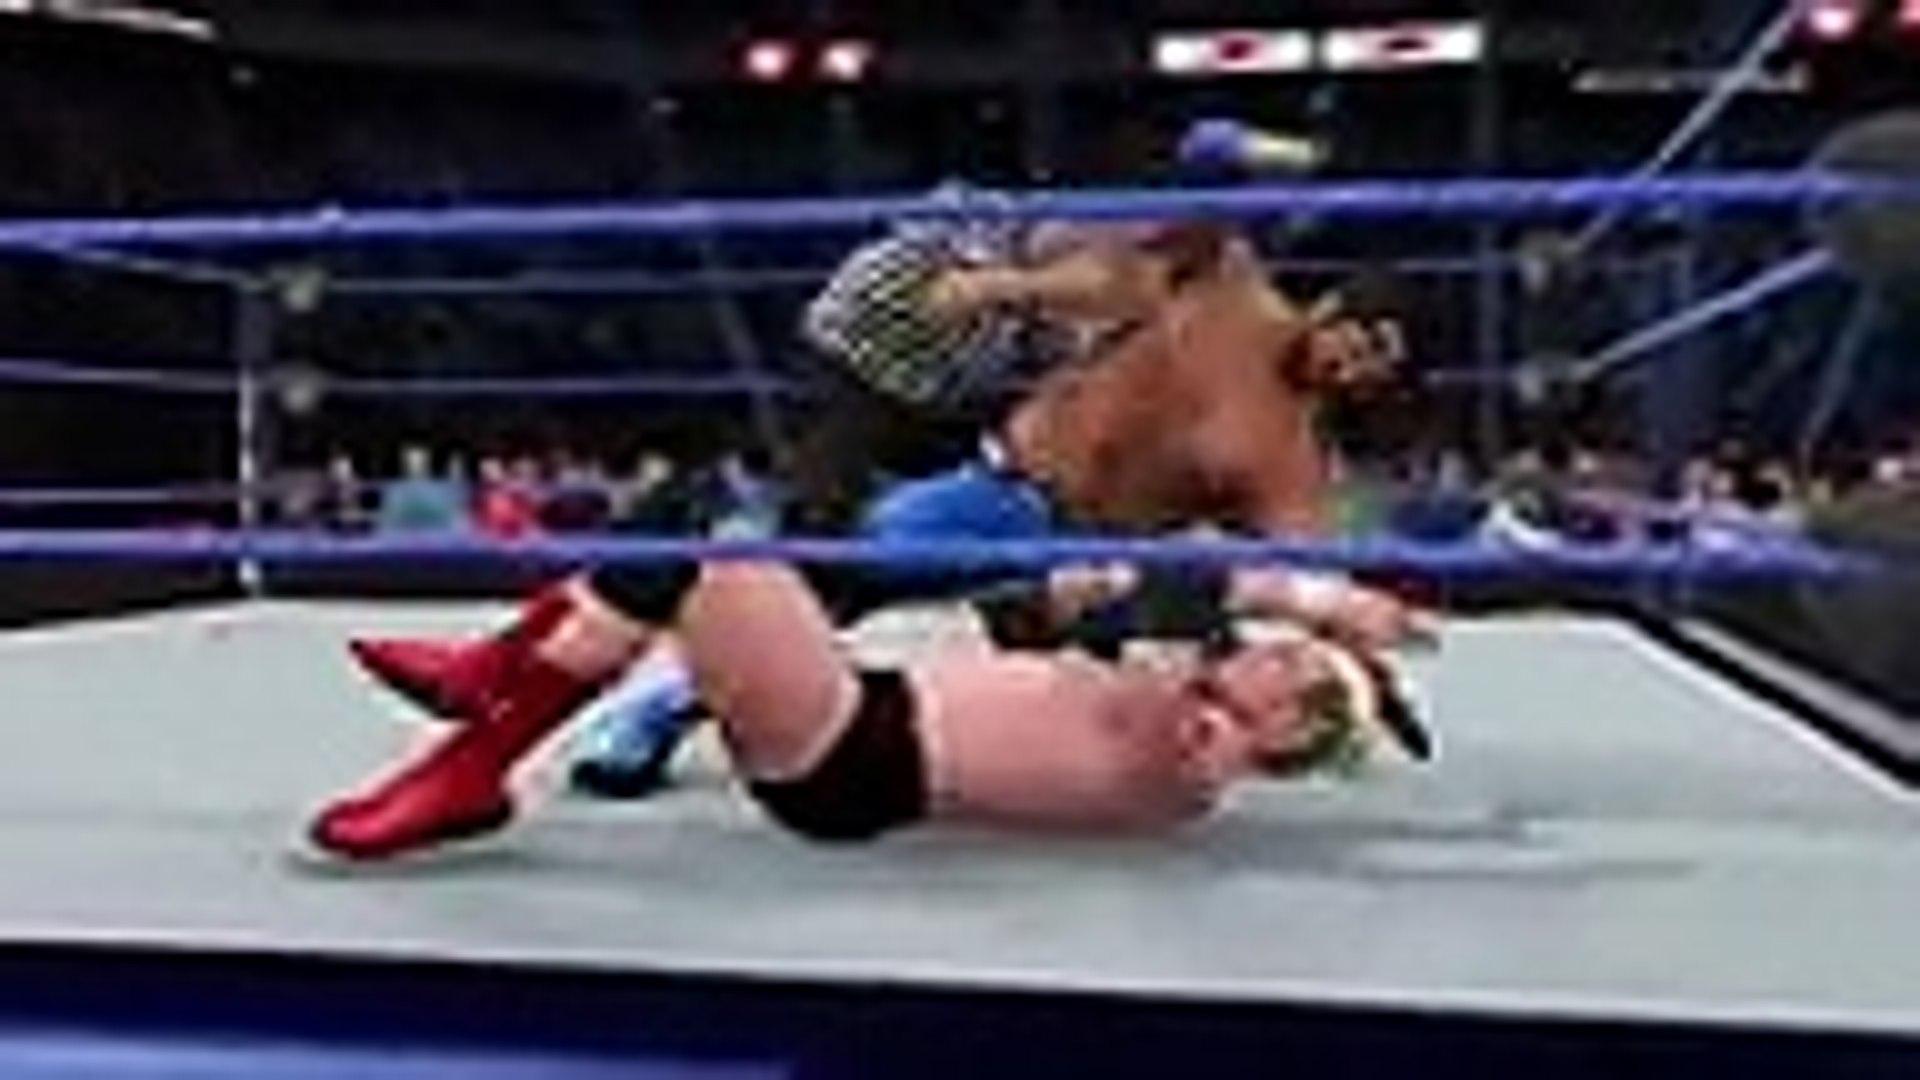 James Ellsworth Wins The WWE World Championship On Smackdown Live! - WWE 2K17 Custom Storyline, tv 2